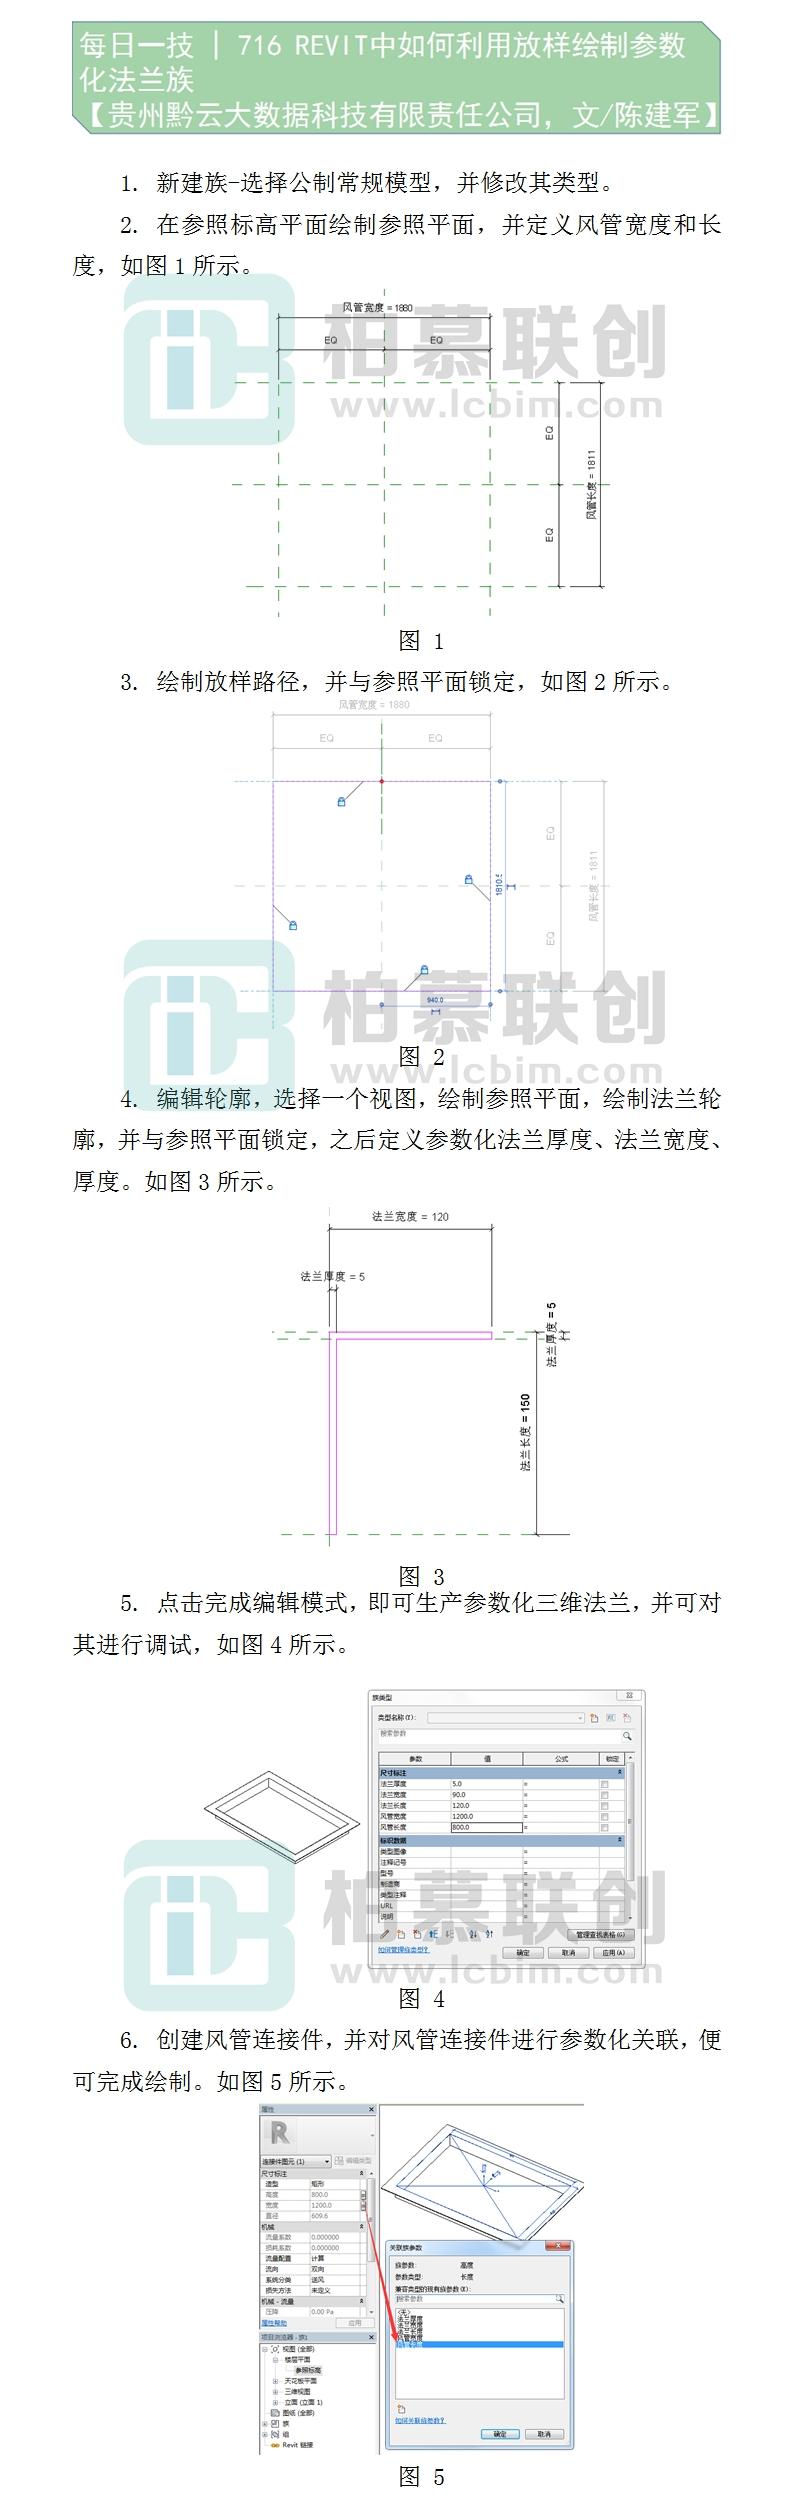 716     REVIT中如何利用放样绘制参数化法兰族--陈建军-贵州黔云大数据科技有限责任公司.jpg